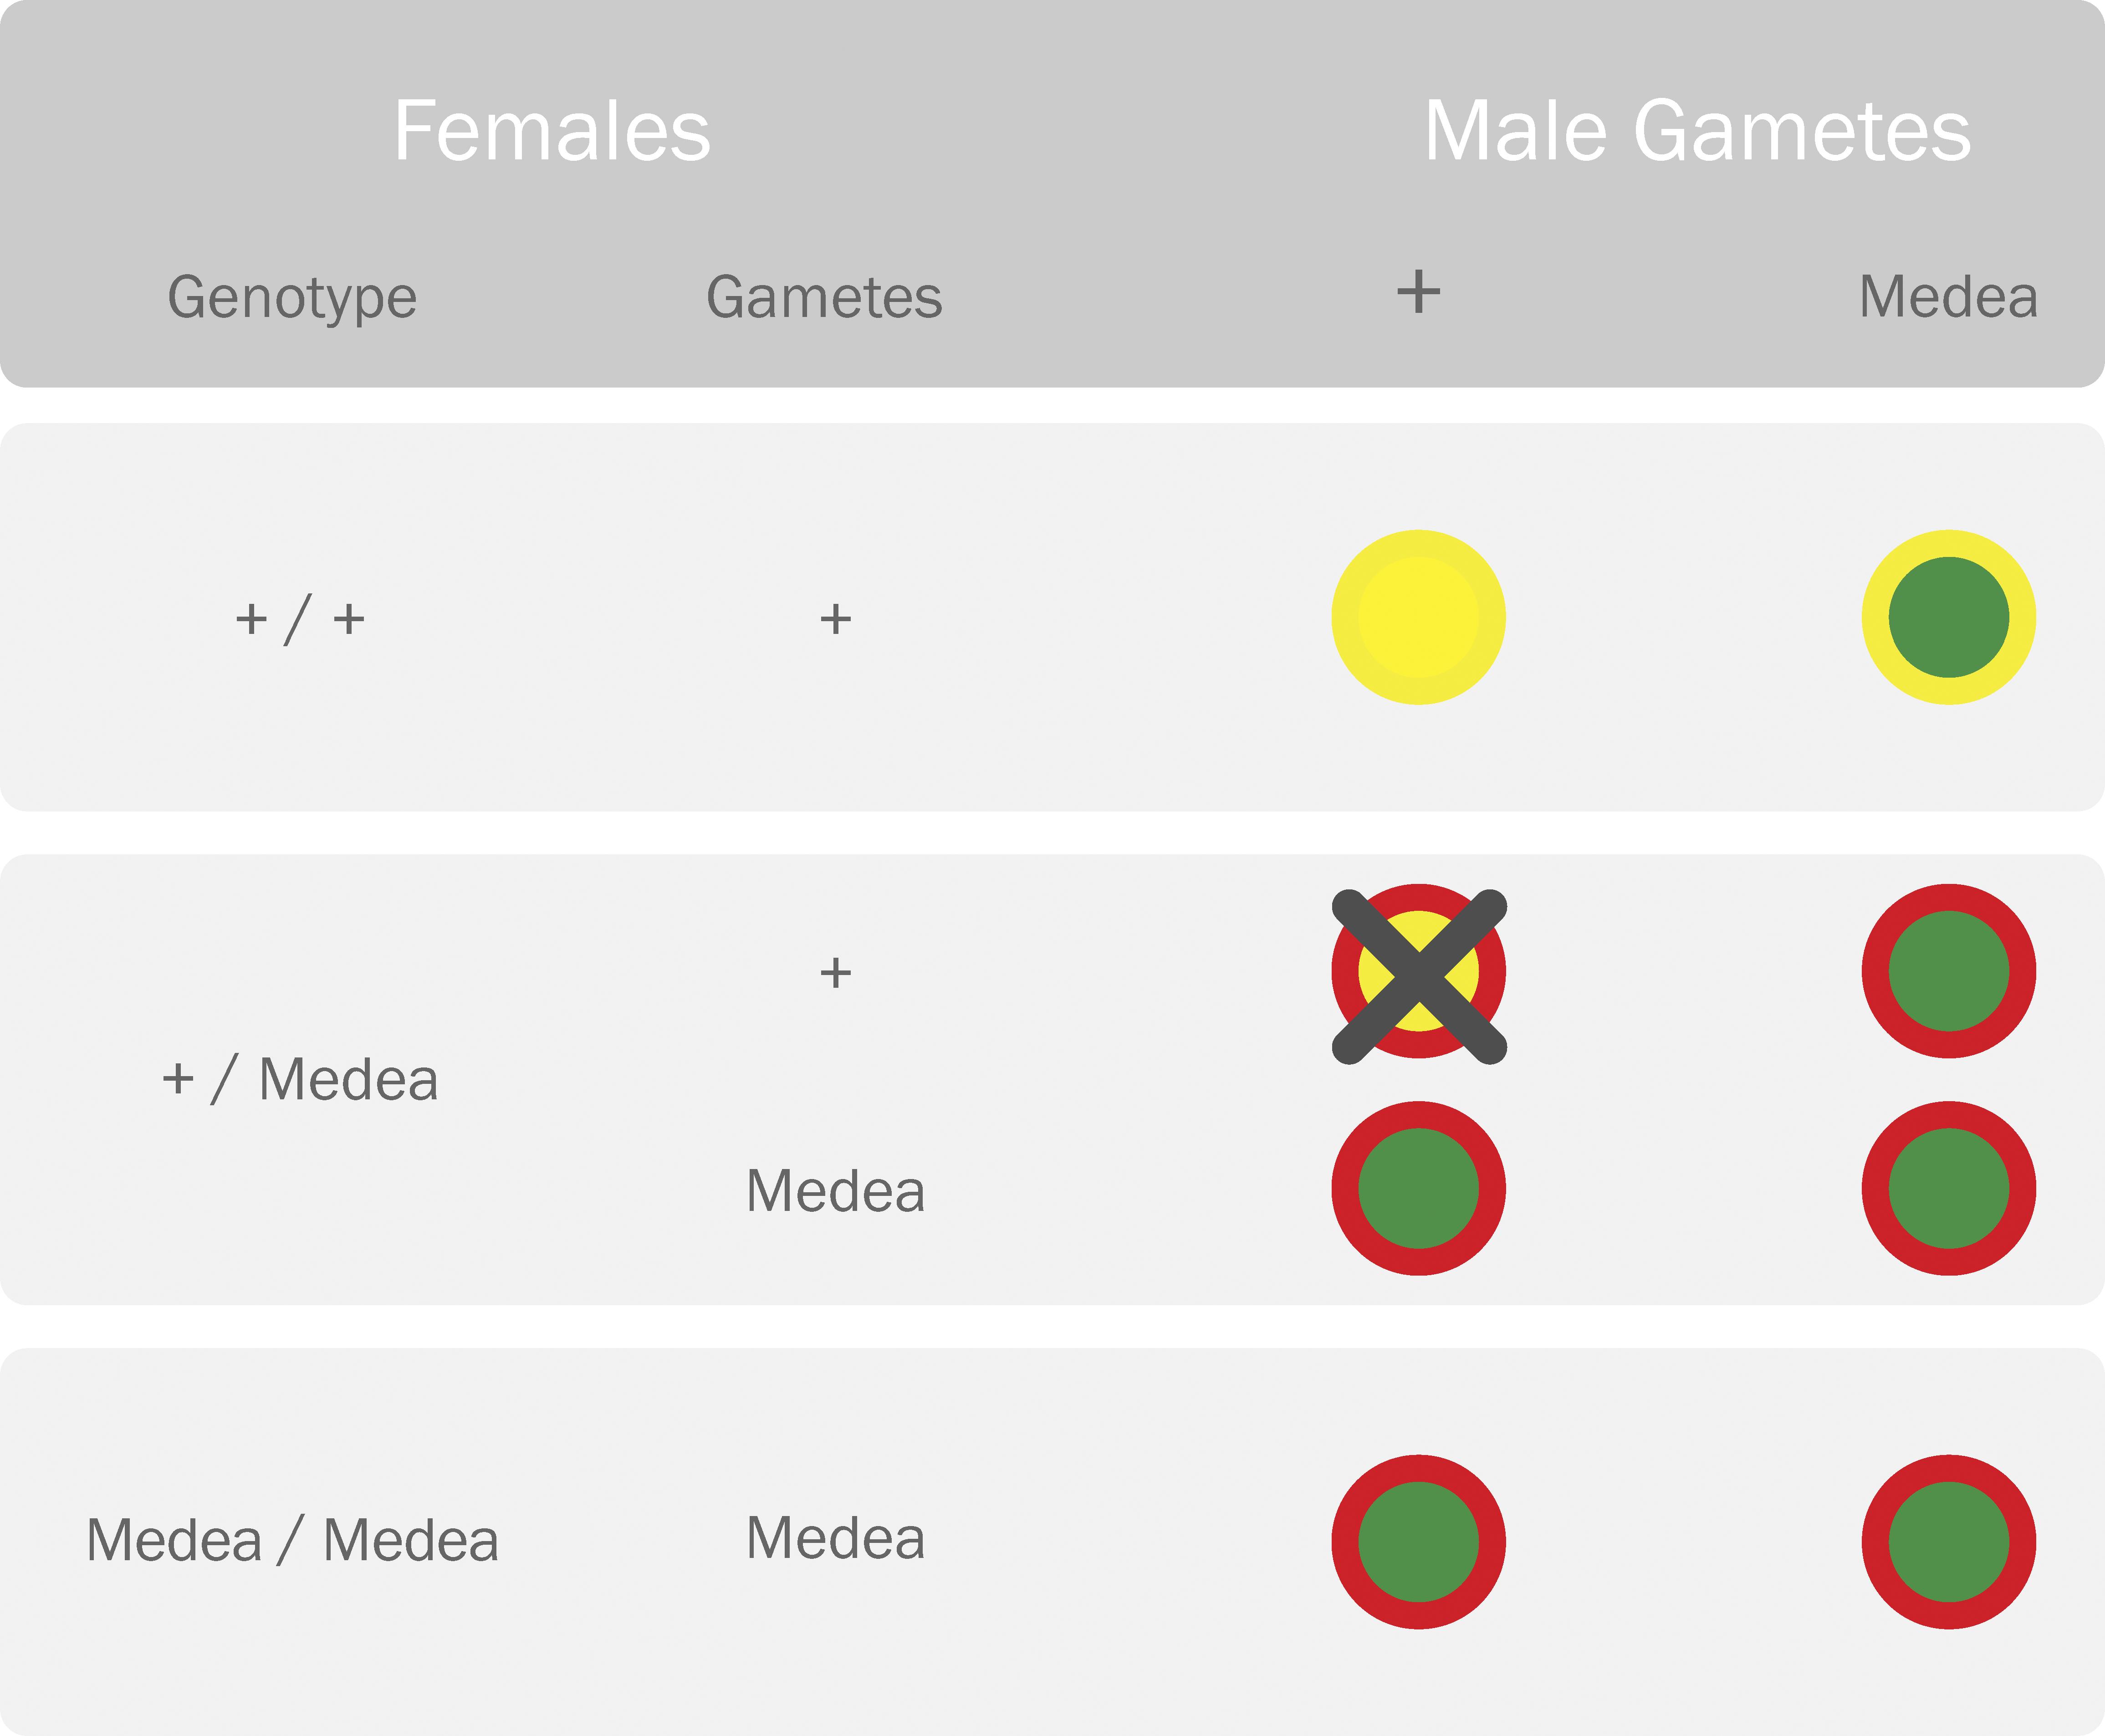 Parental Crosses Representing the Reproductive Advantage of the <i>Medea</i> Allele